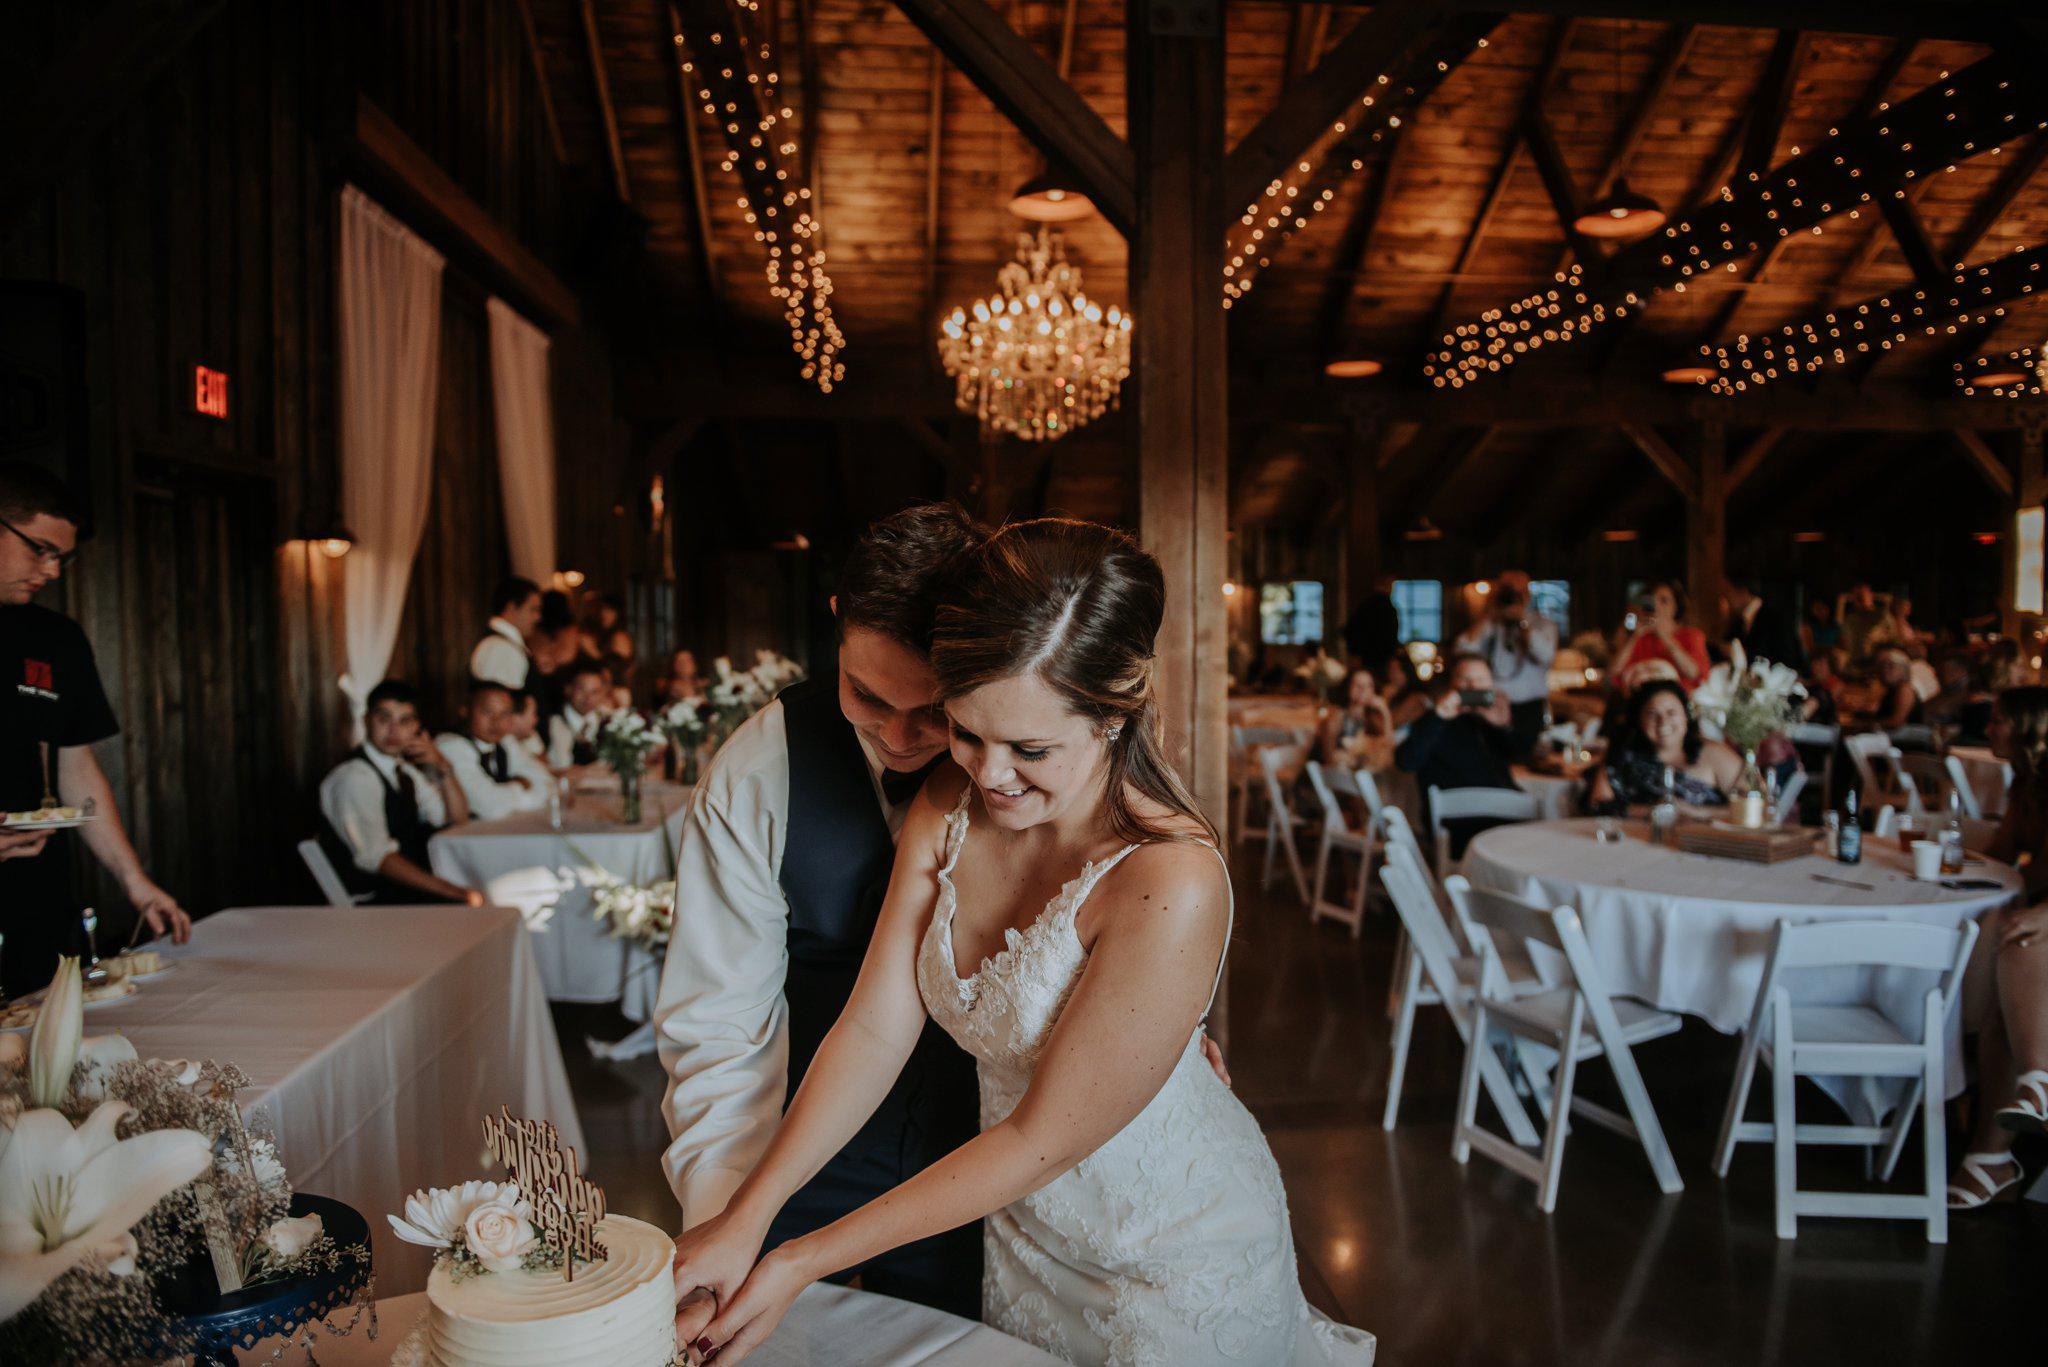 kristen-and-cody-the-kelley-farm-wedding-seattle-photographer-caitlyn-nikula-85.jpg